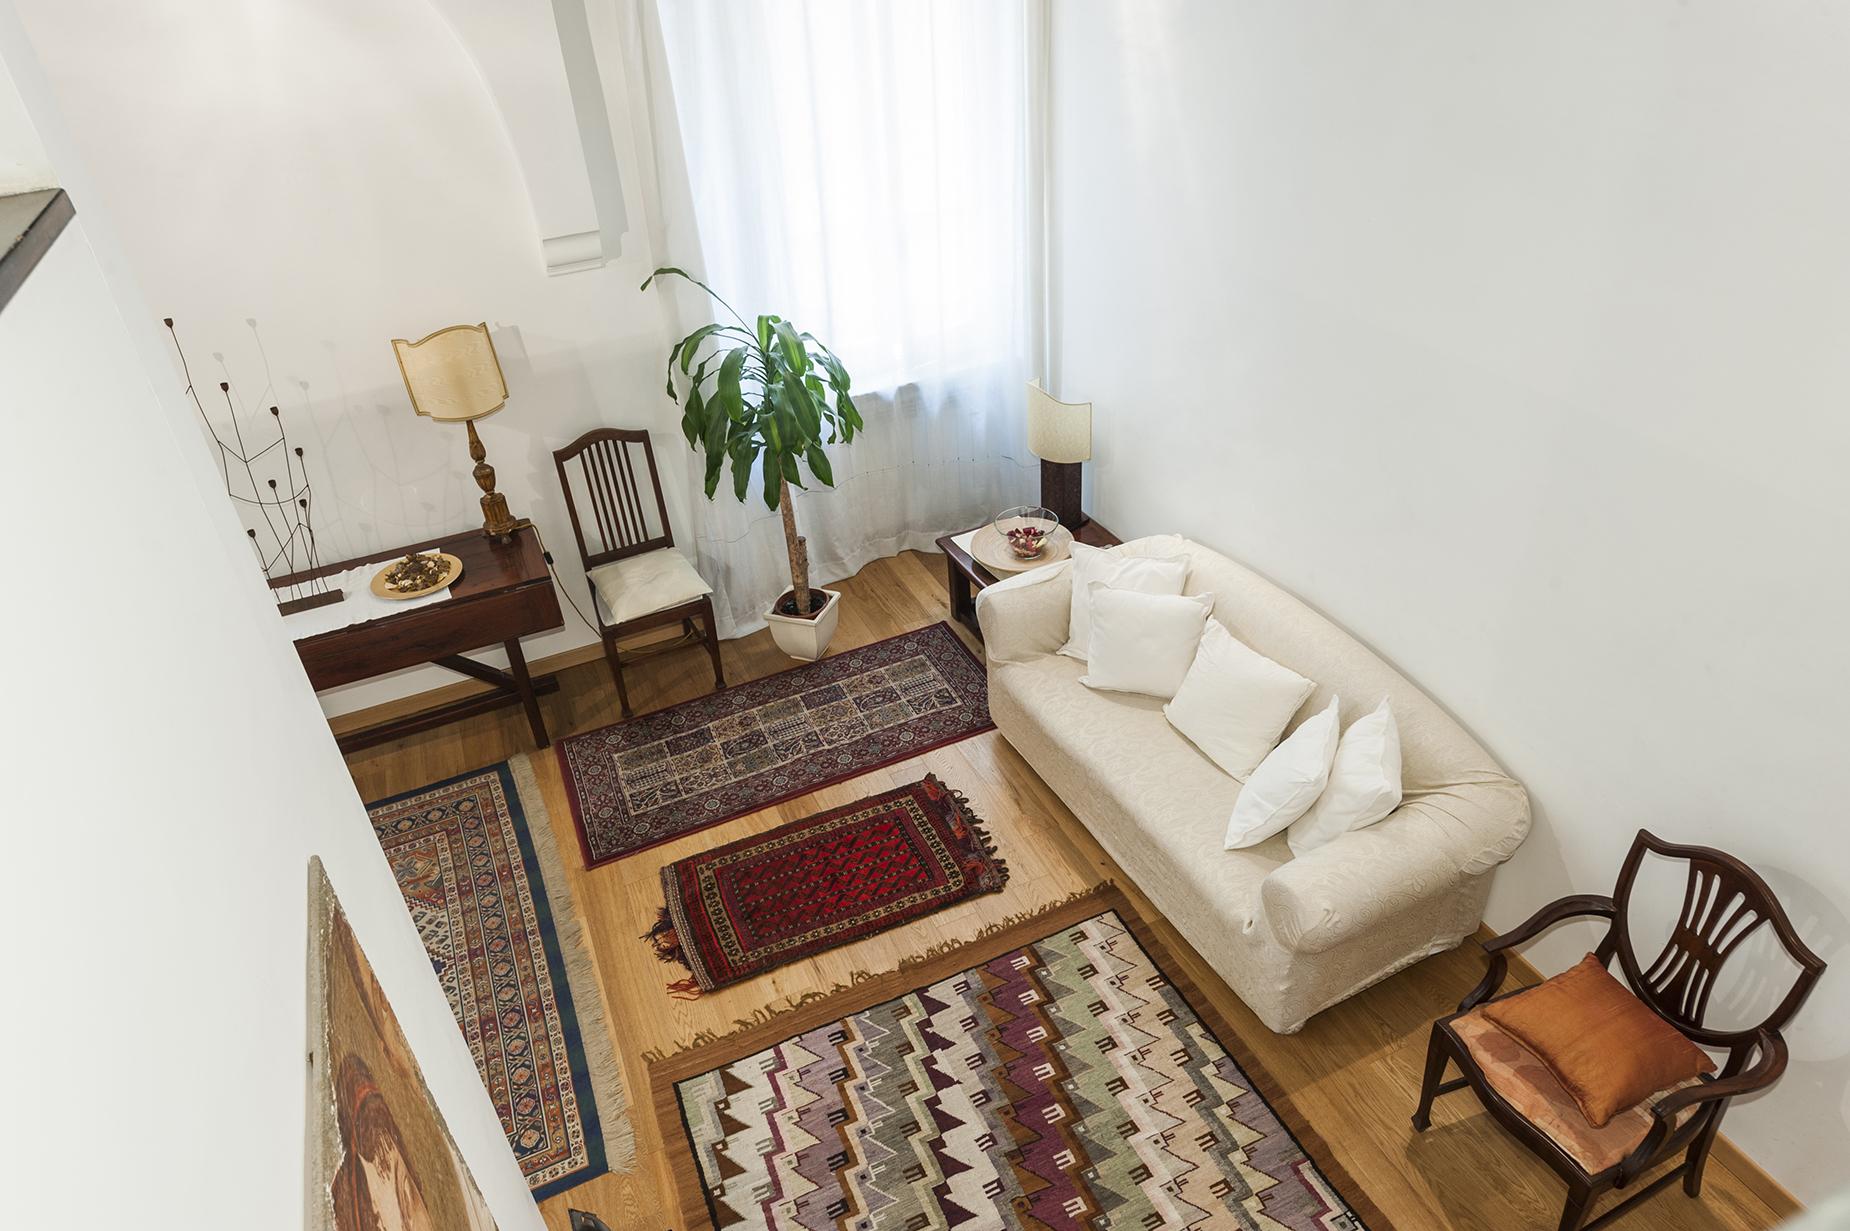 Additional photo for property listing at Charming apartment near Piazza Farnese Vicolo delle Grotte Rome, Roma 00186 Italia